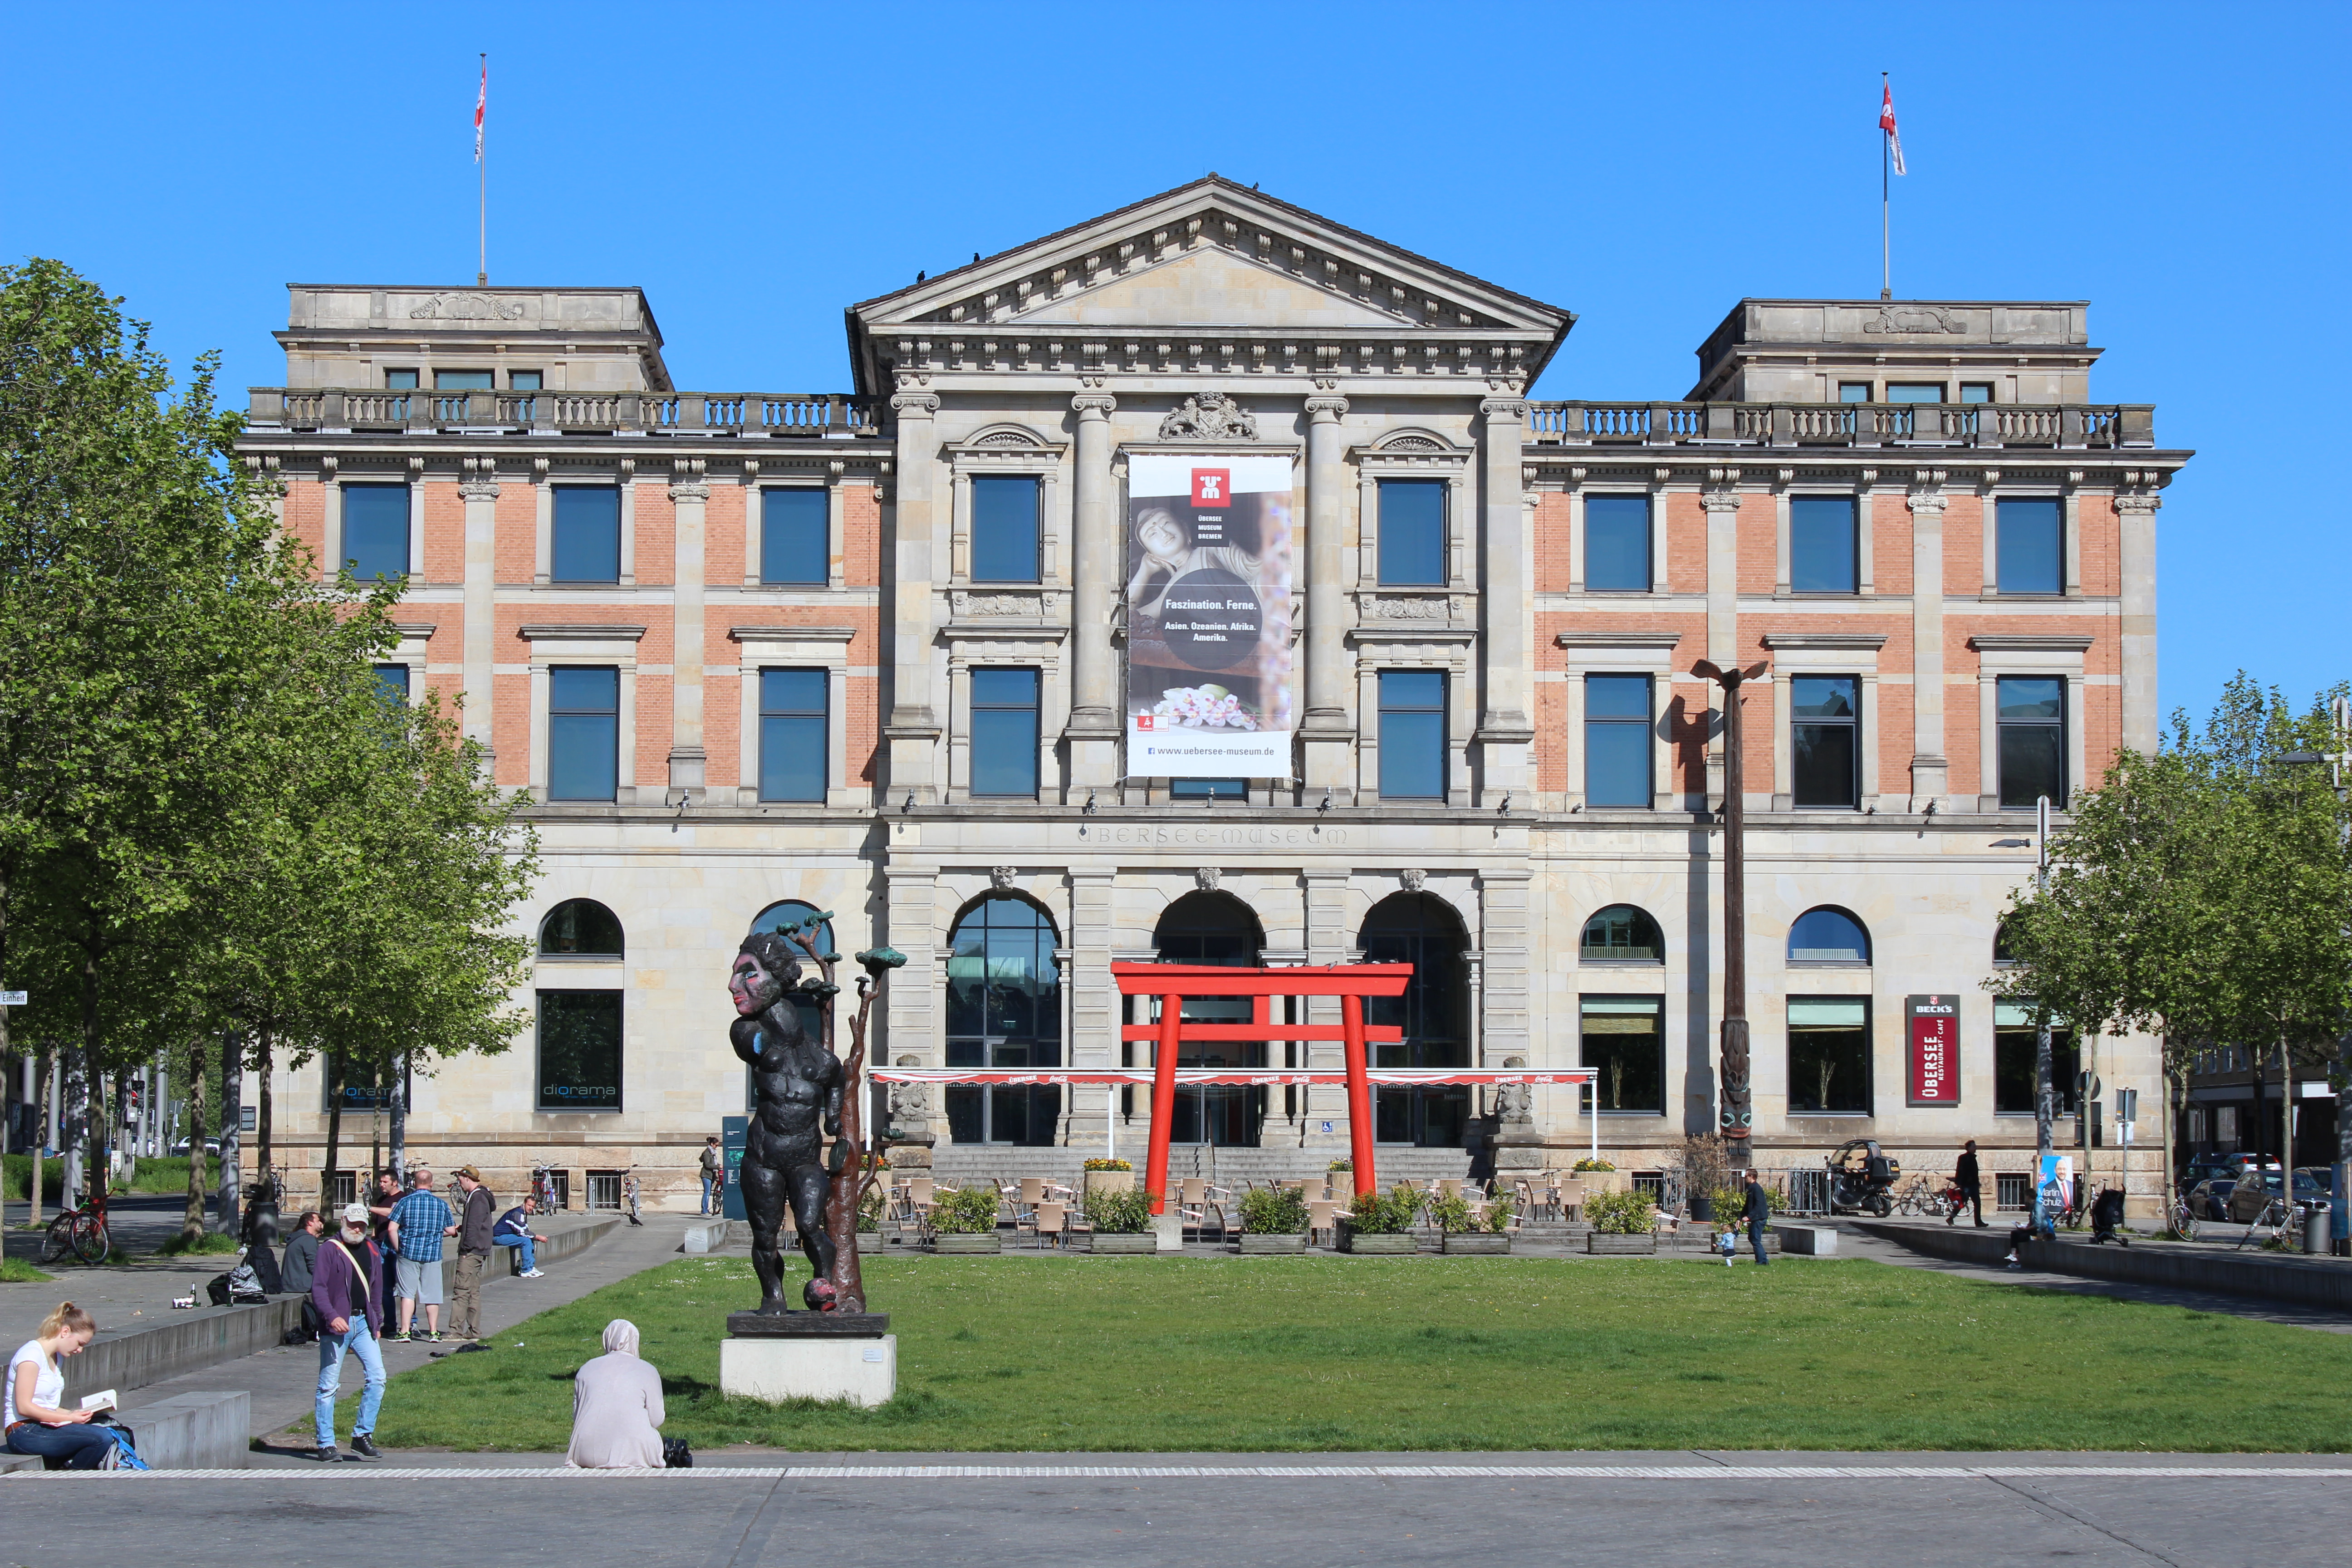 überseemuseum viagem hamburgo bremen